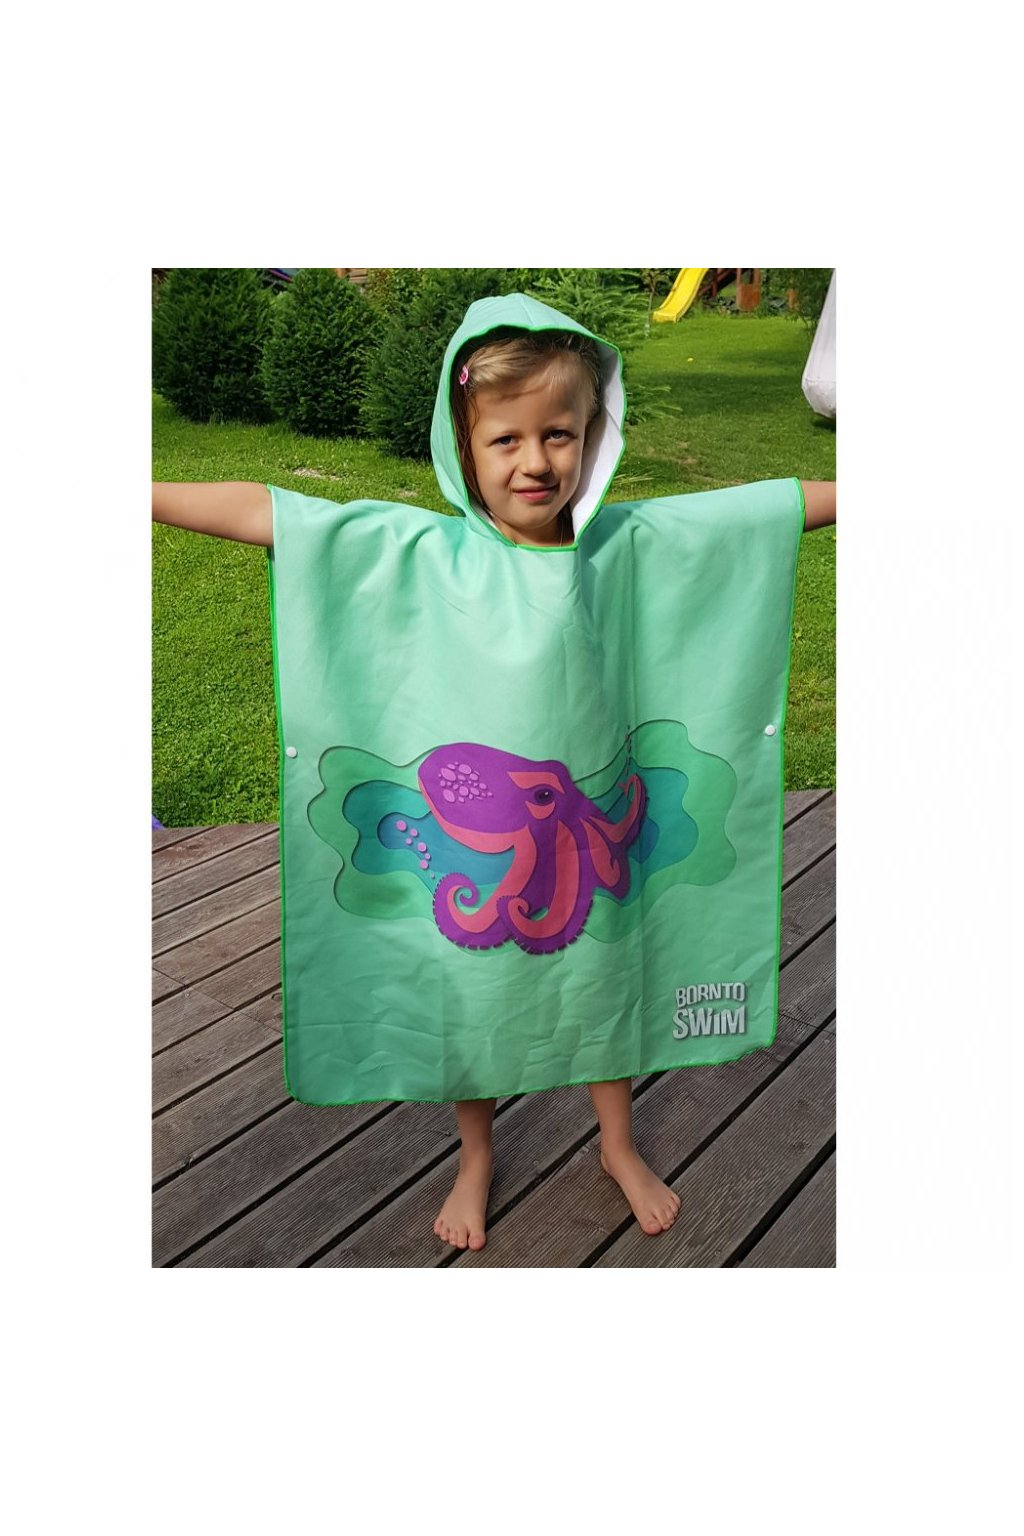 teple poncho pro skolaky chobotnice 1